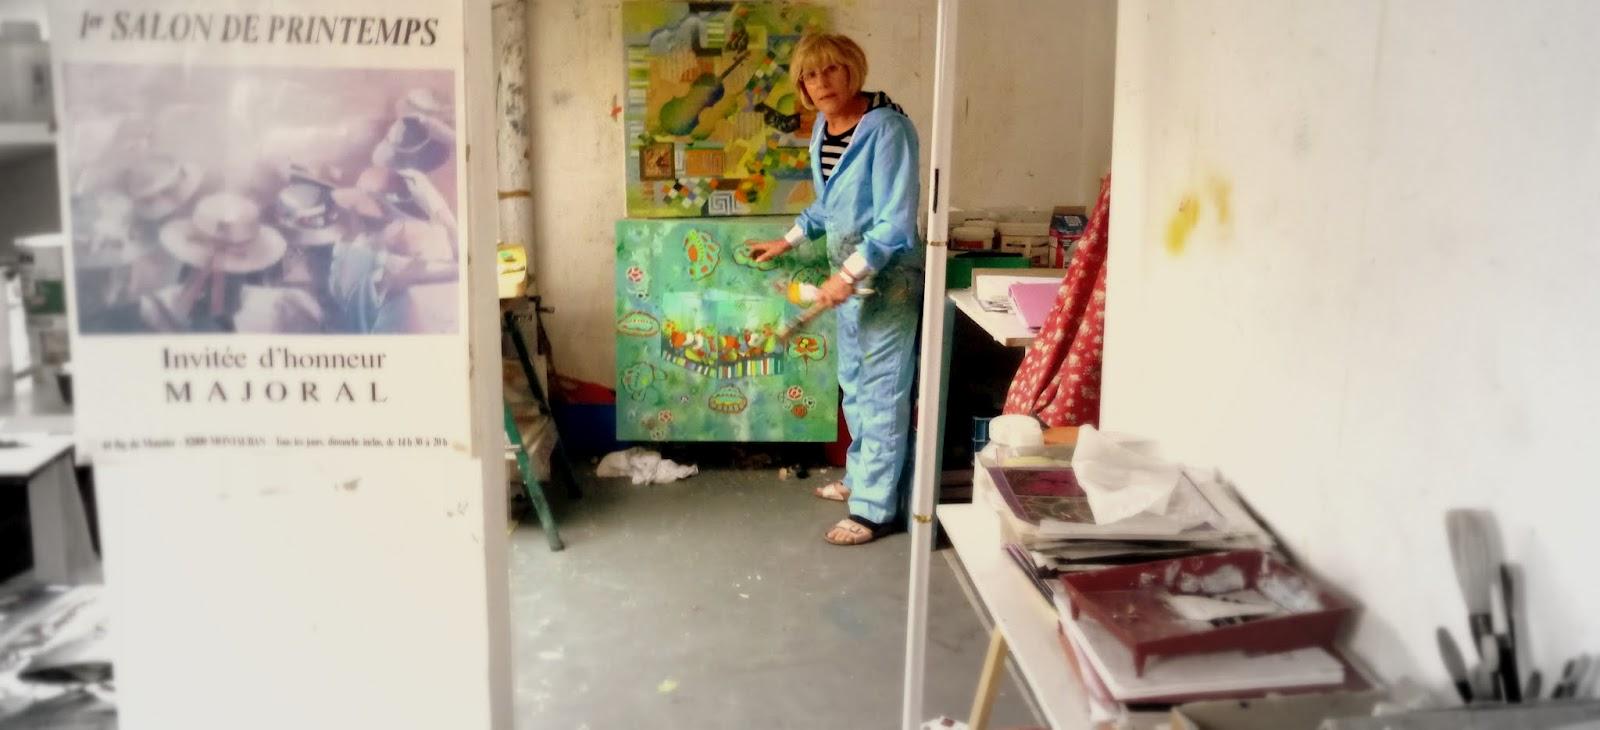 georgette majoral artiste peintre sur toulouse. Black Bedroom Furniture Sets. Home Design Ideas